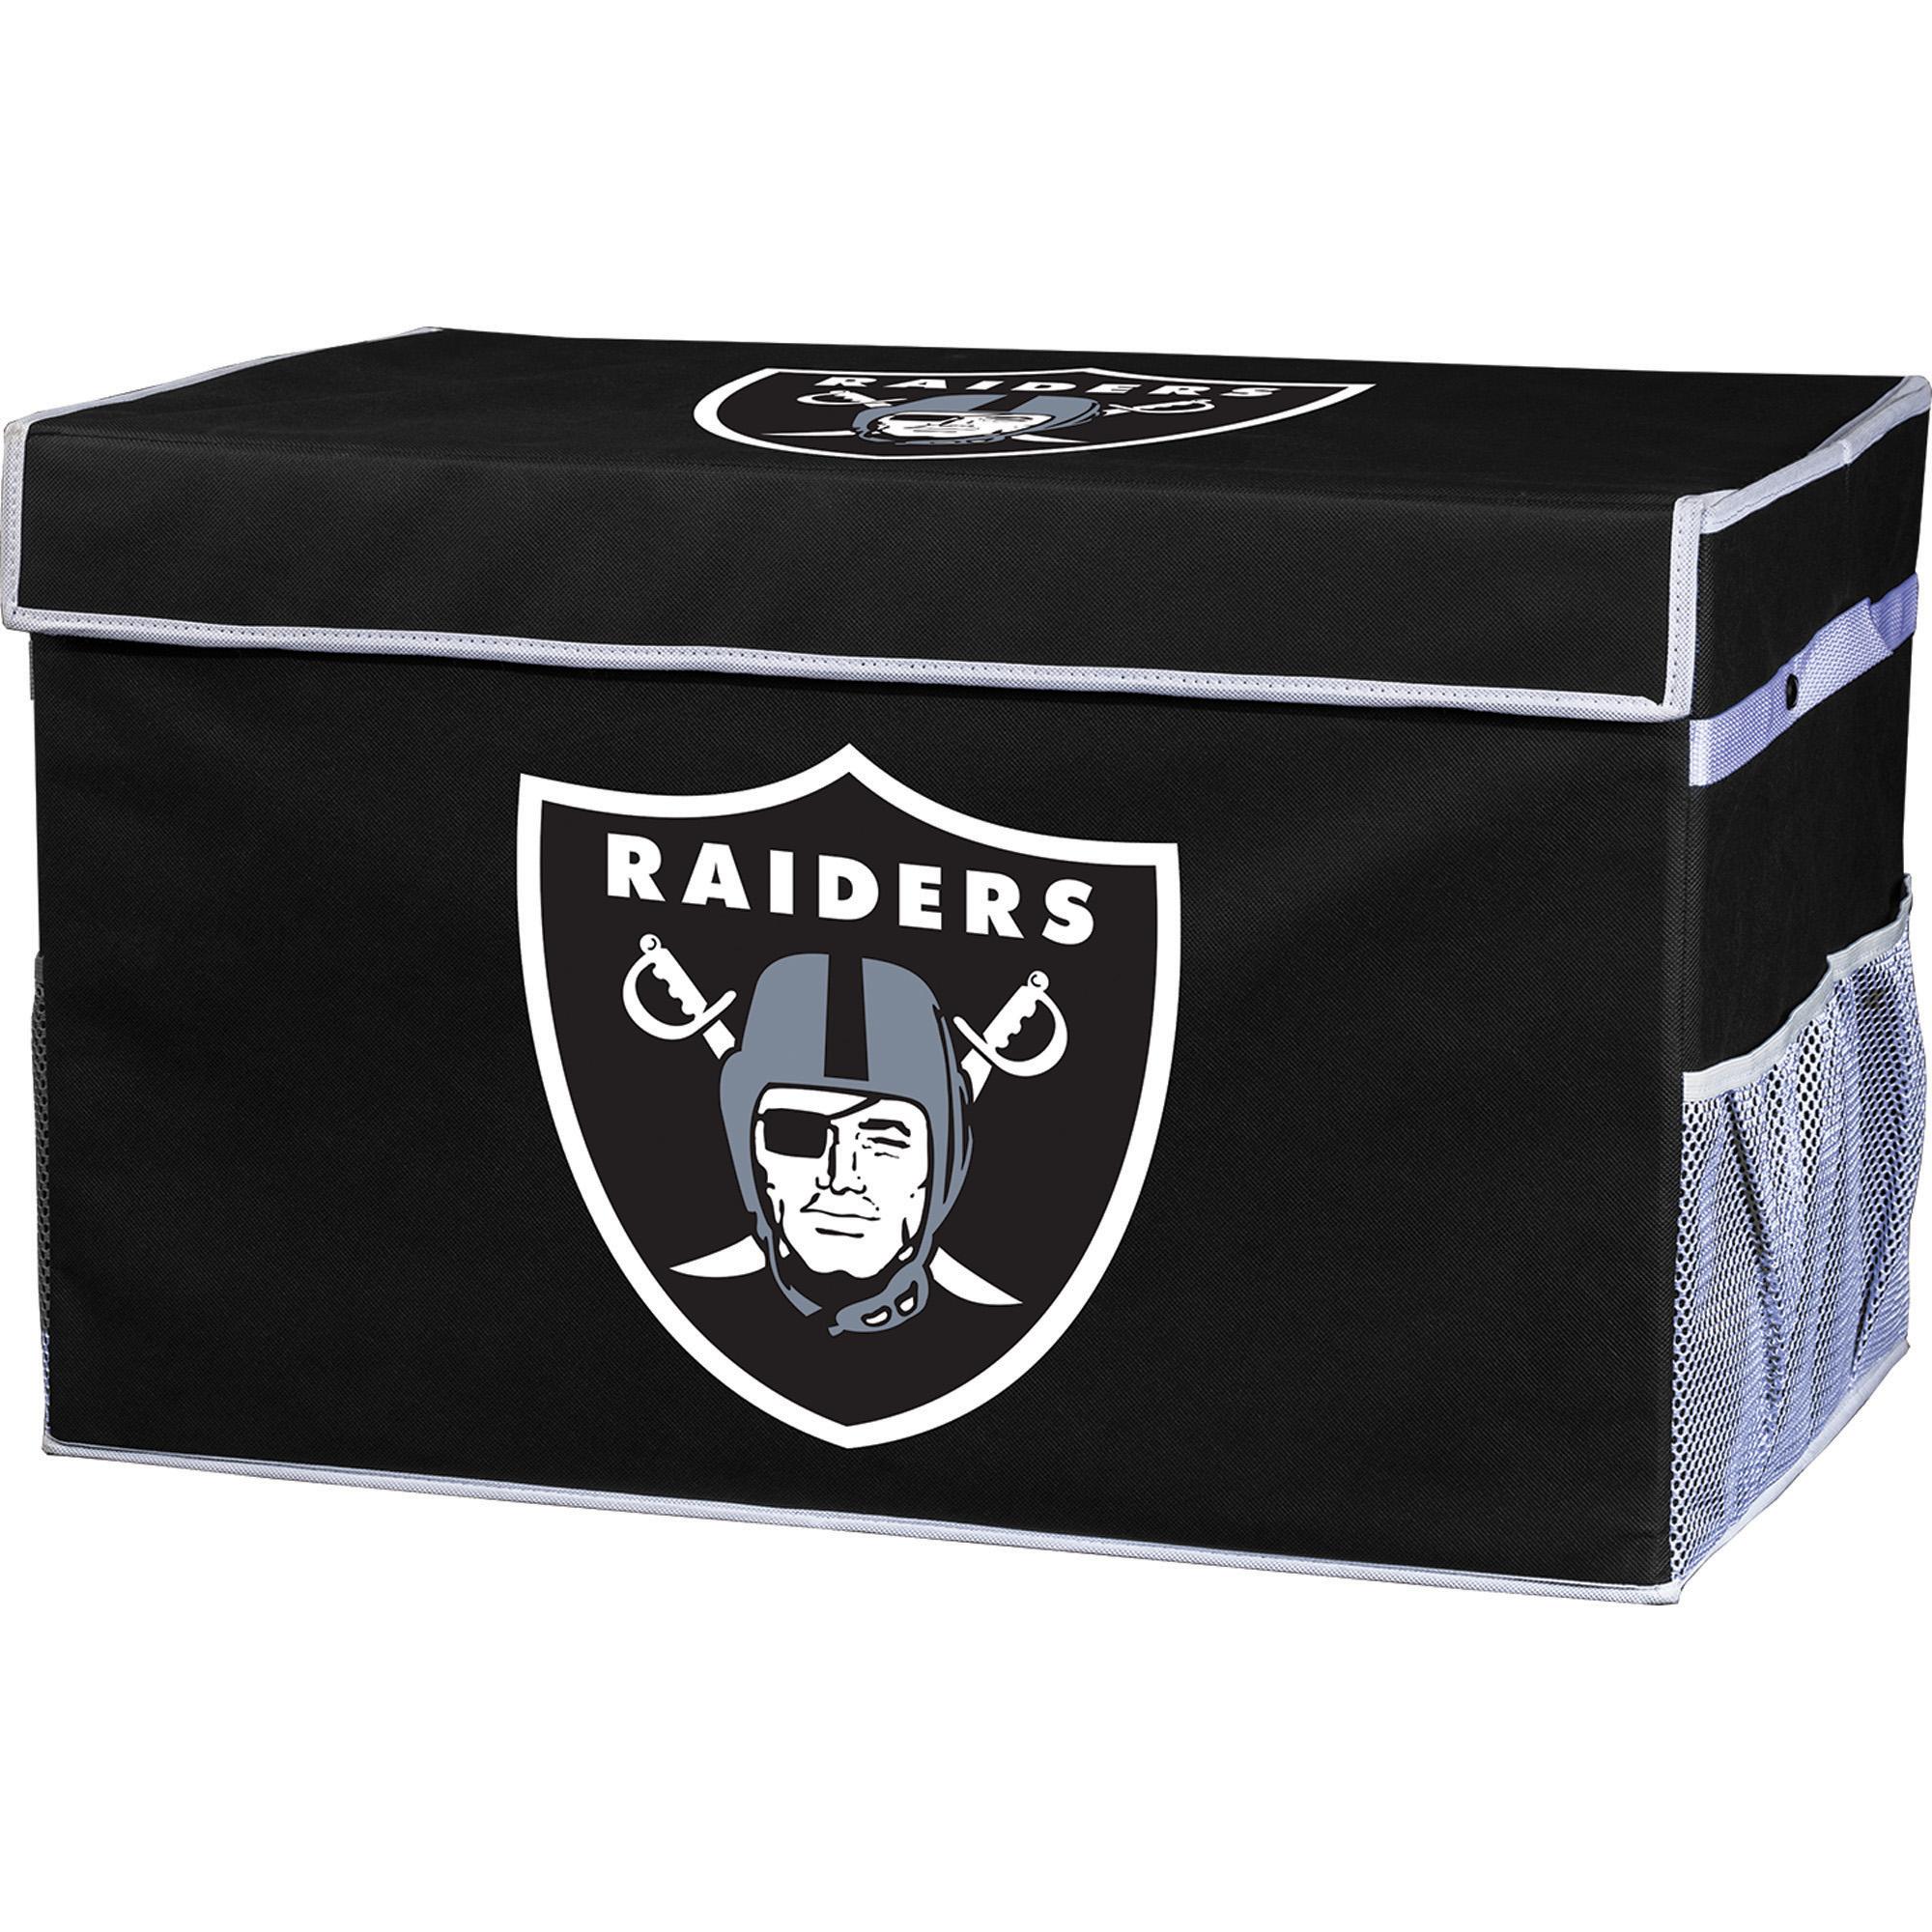 Franklin Sports NFL Oakland Raiders Collapsible Storage Footlocker Bins - Small